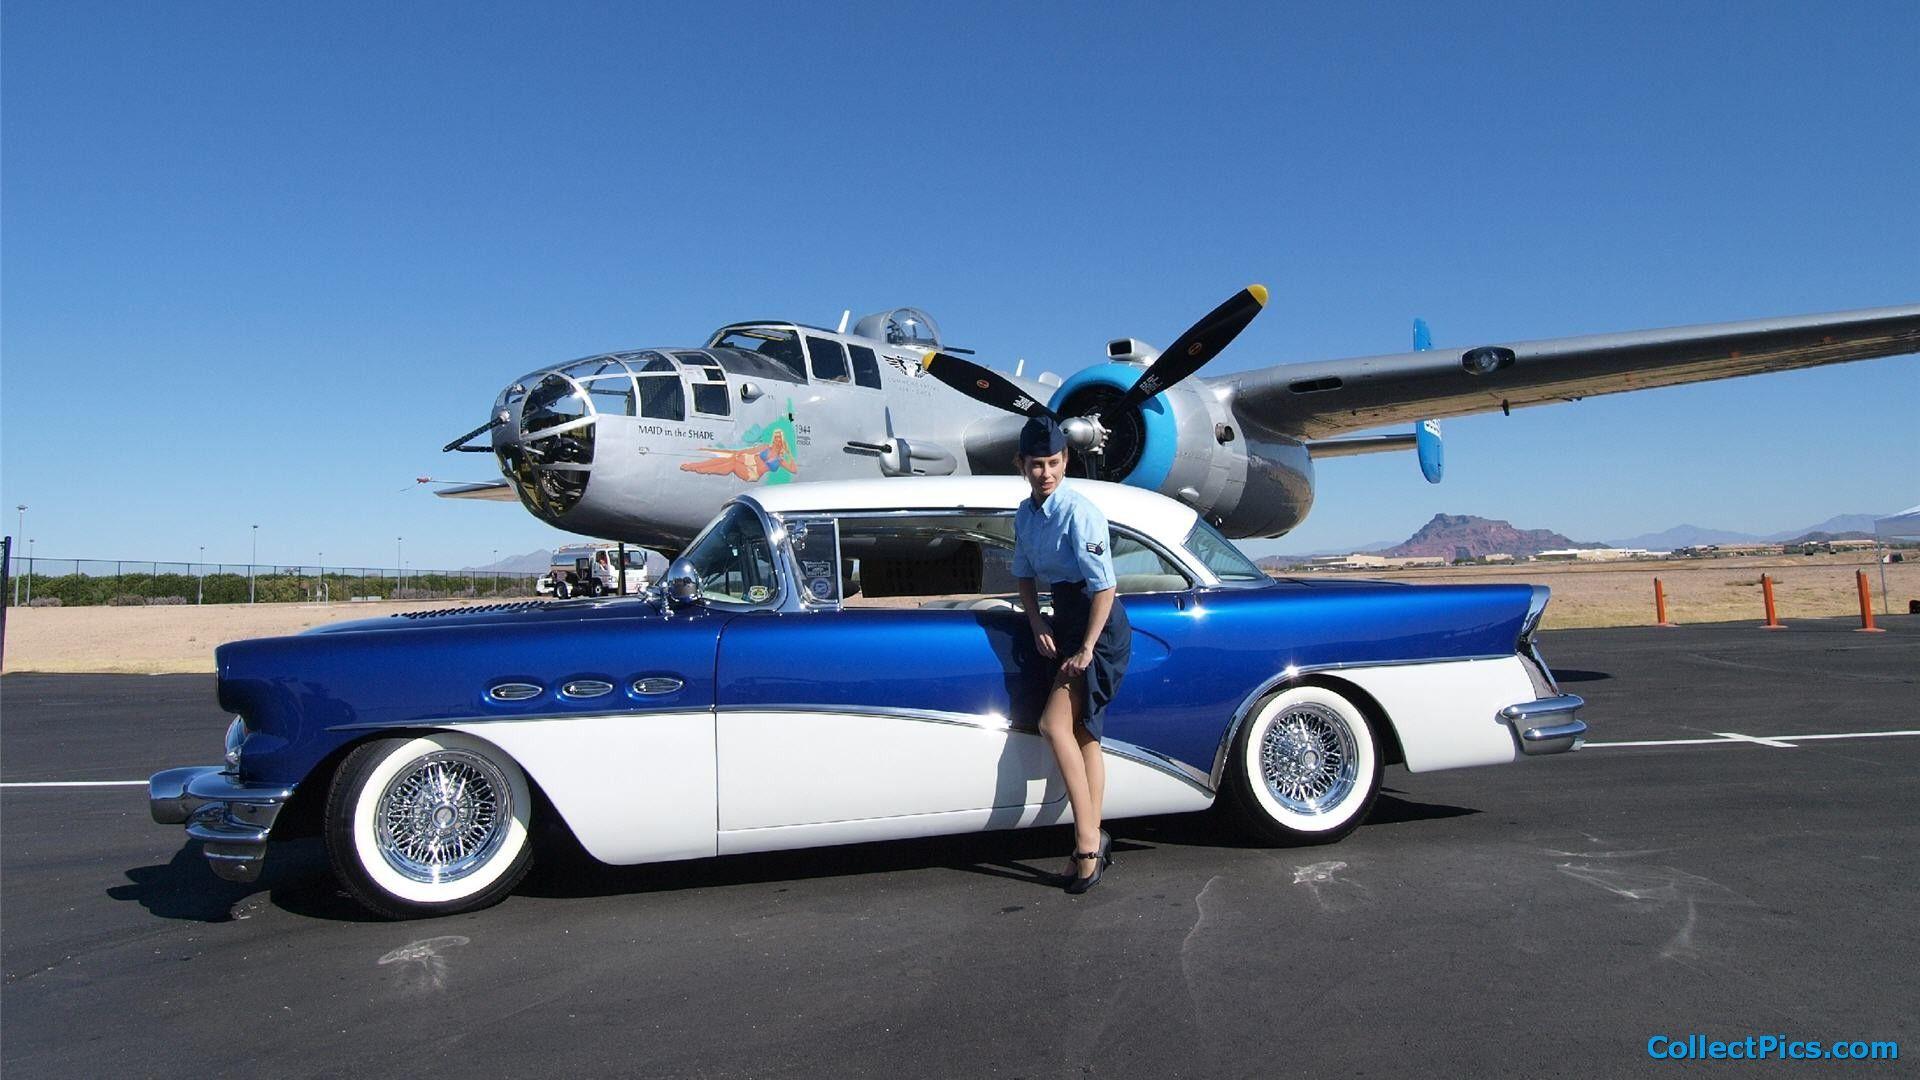 Car Plane Wallpaper Autos Clasicos Autos Motores